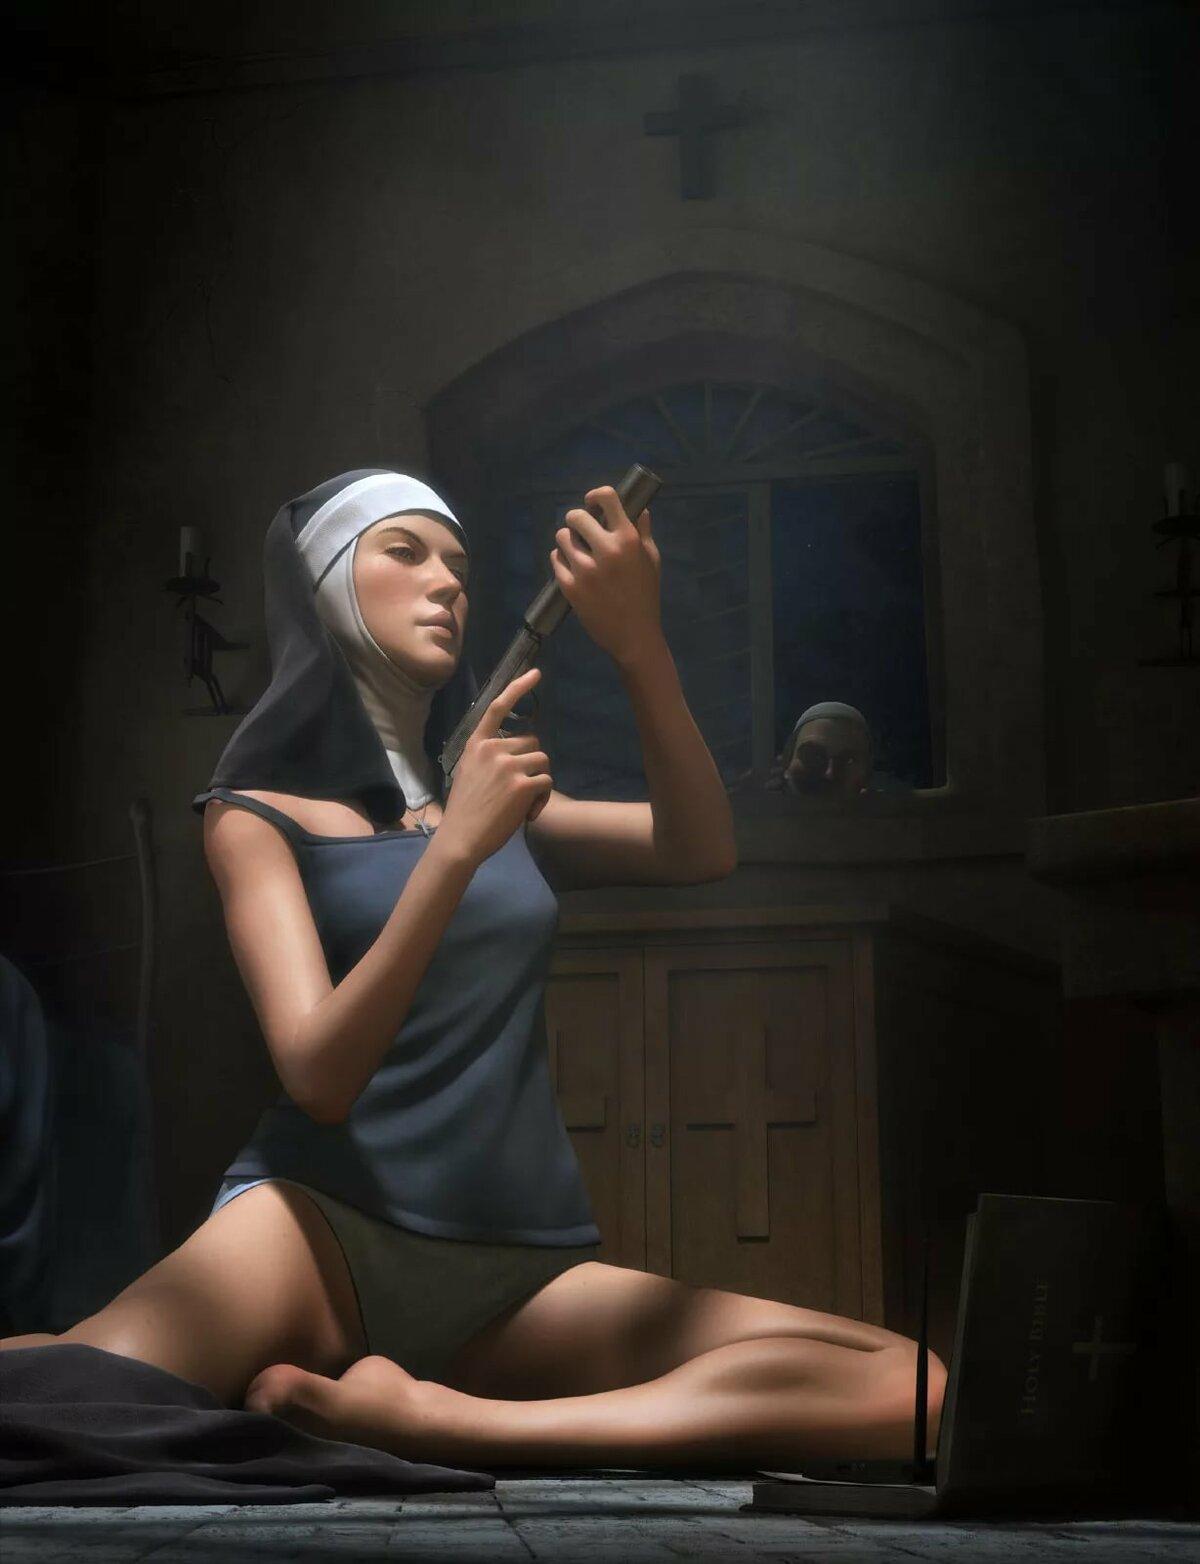 Sexy nuns fantasy girls, oksana dharcourt porn movies